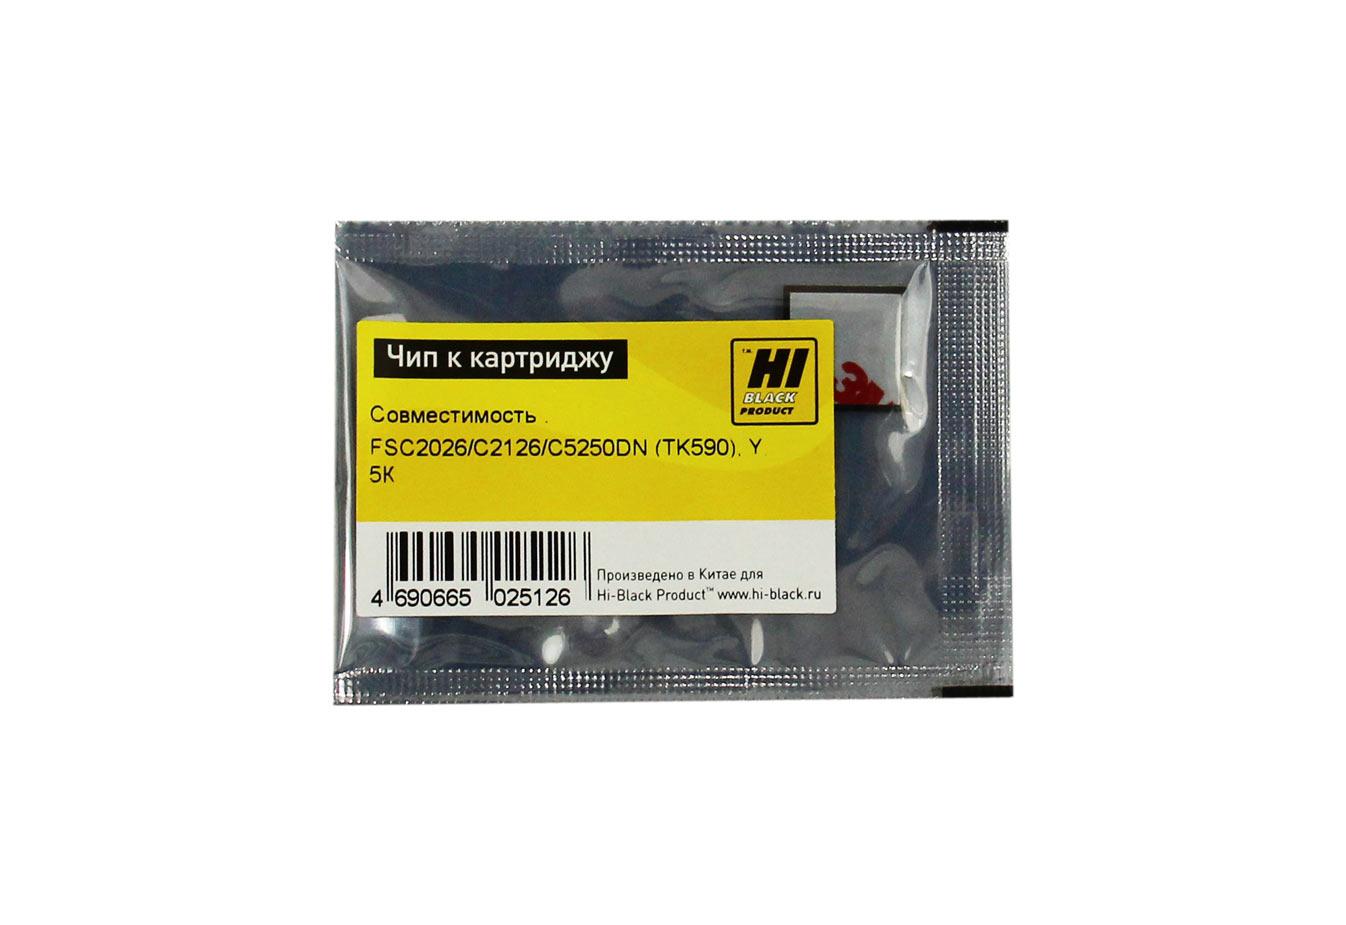 Чип Hi-Black к картриджу Kyocera FS-C2026/C2126MFP/C5250DN (TK-590), Y, 5К